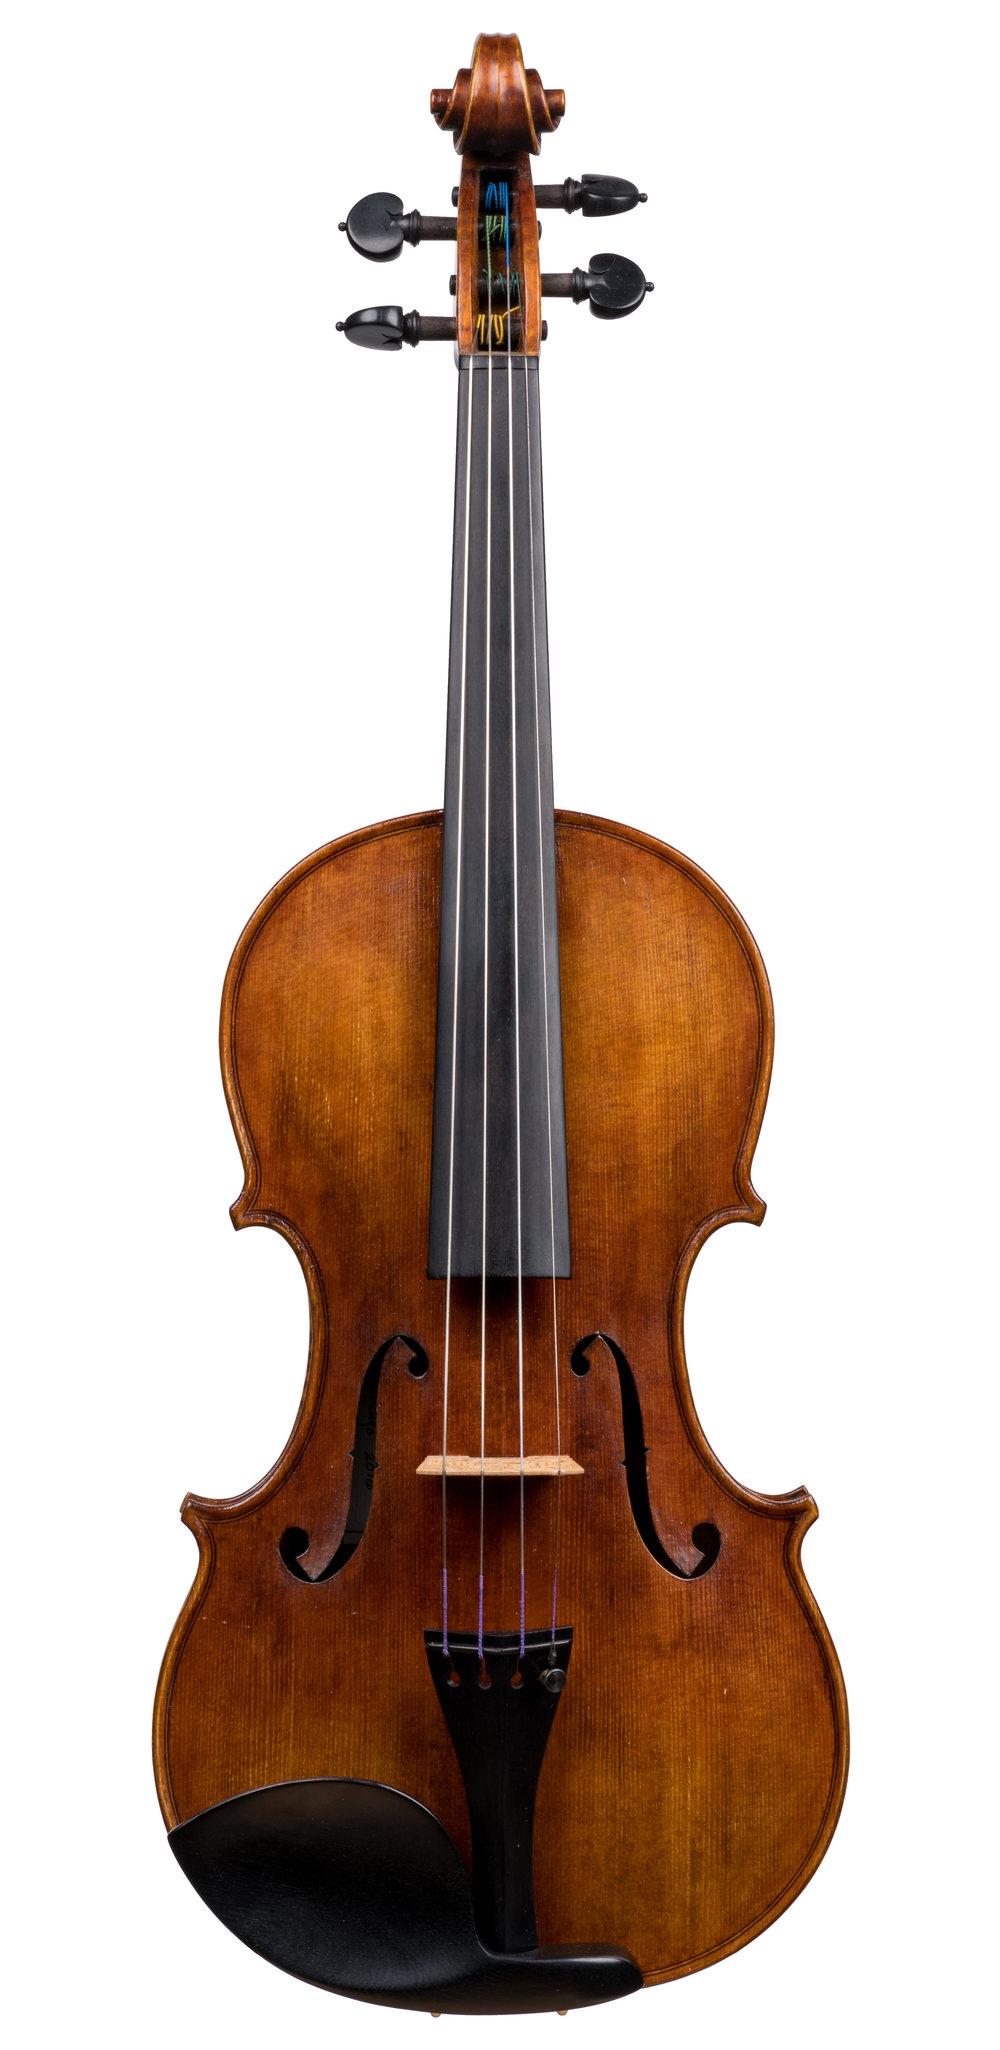 Kristin A. Siegfried violin, Chicago, 2016 -